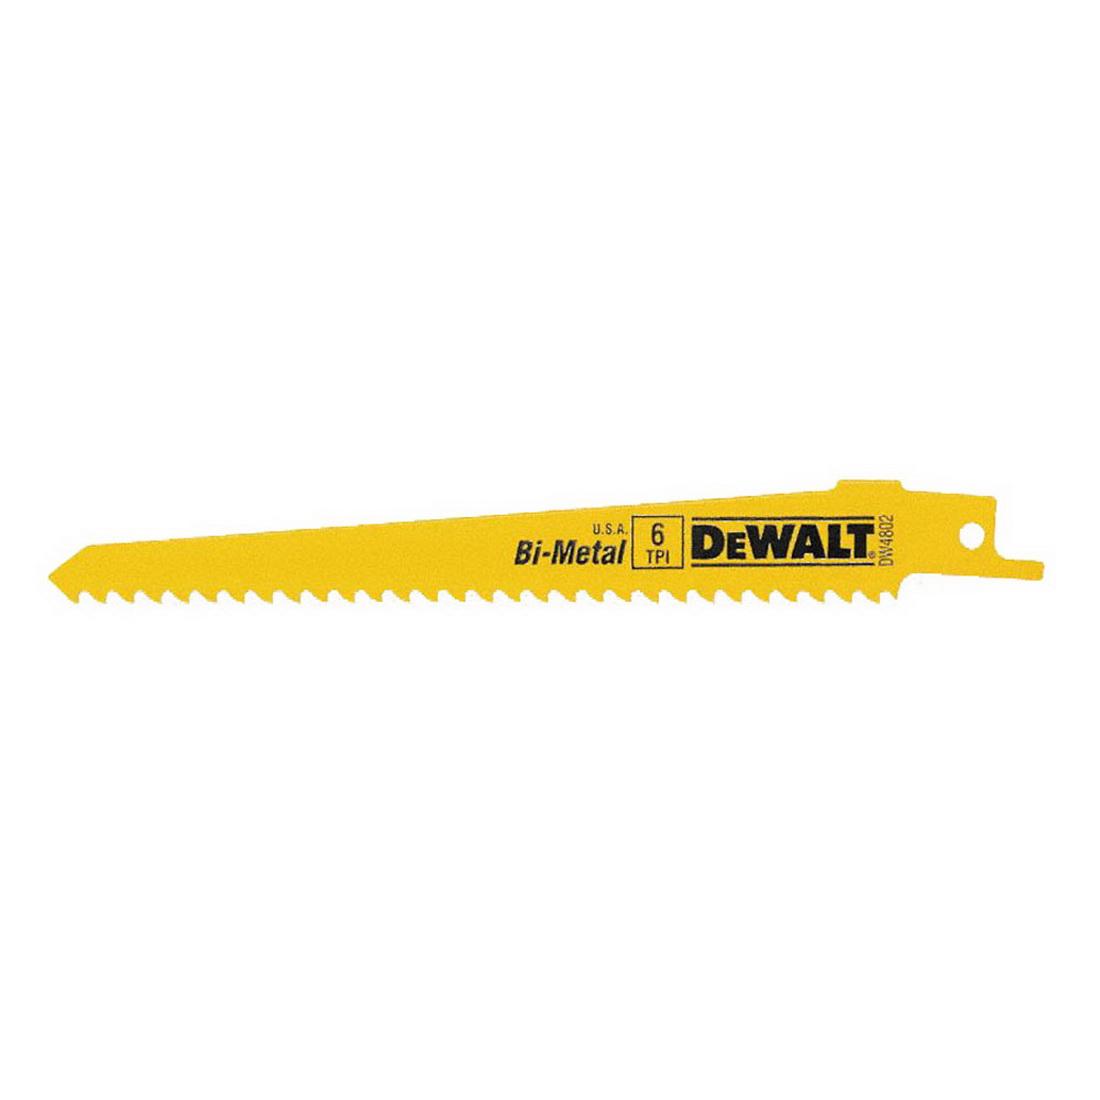 6 x 3/4 inch 6TPI Universal Shank Reciprocating Saw Blade Bi-Metal 5 Pack